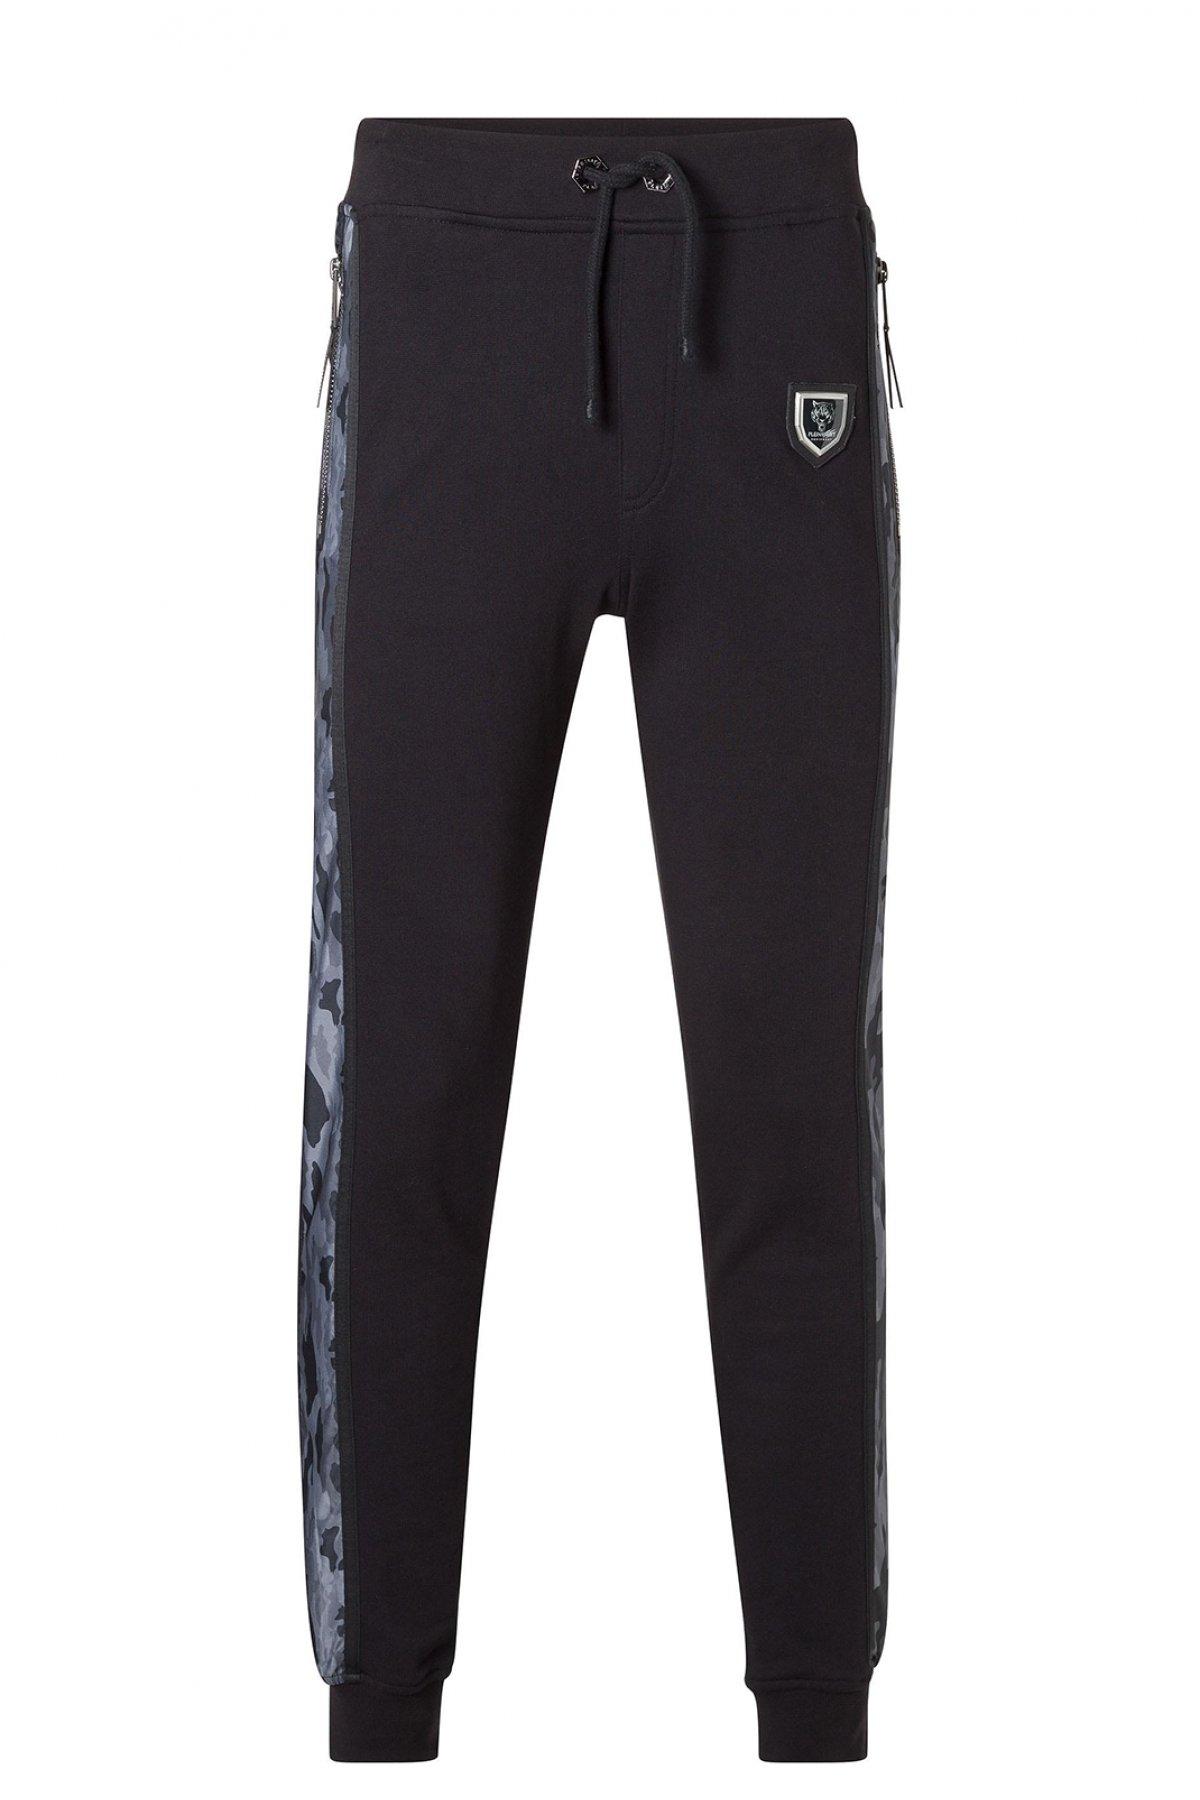 Pantalon sportswear finit